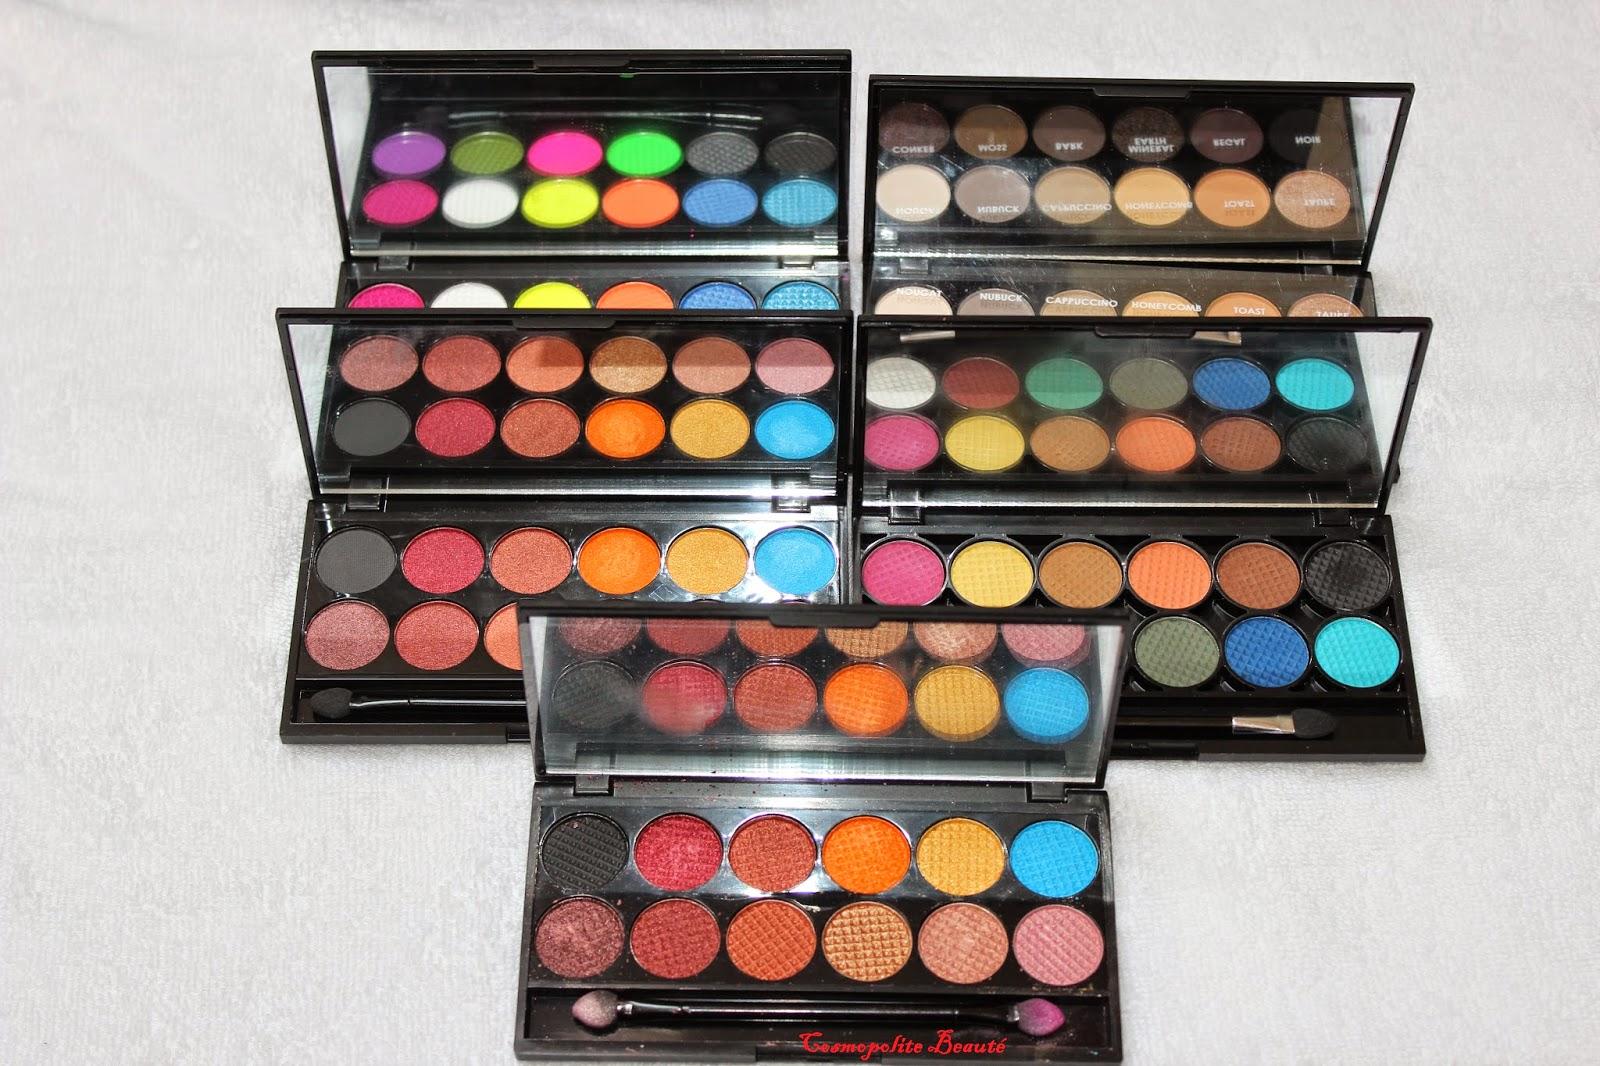 maquillage, fards à paupières, sleek, Guerlain, Shiseido, ysl, mufe, biguine, SLA, UNE, Bourjois